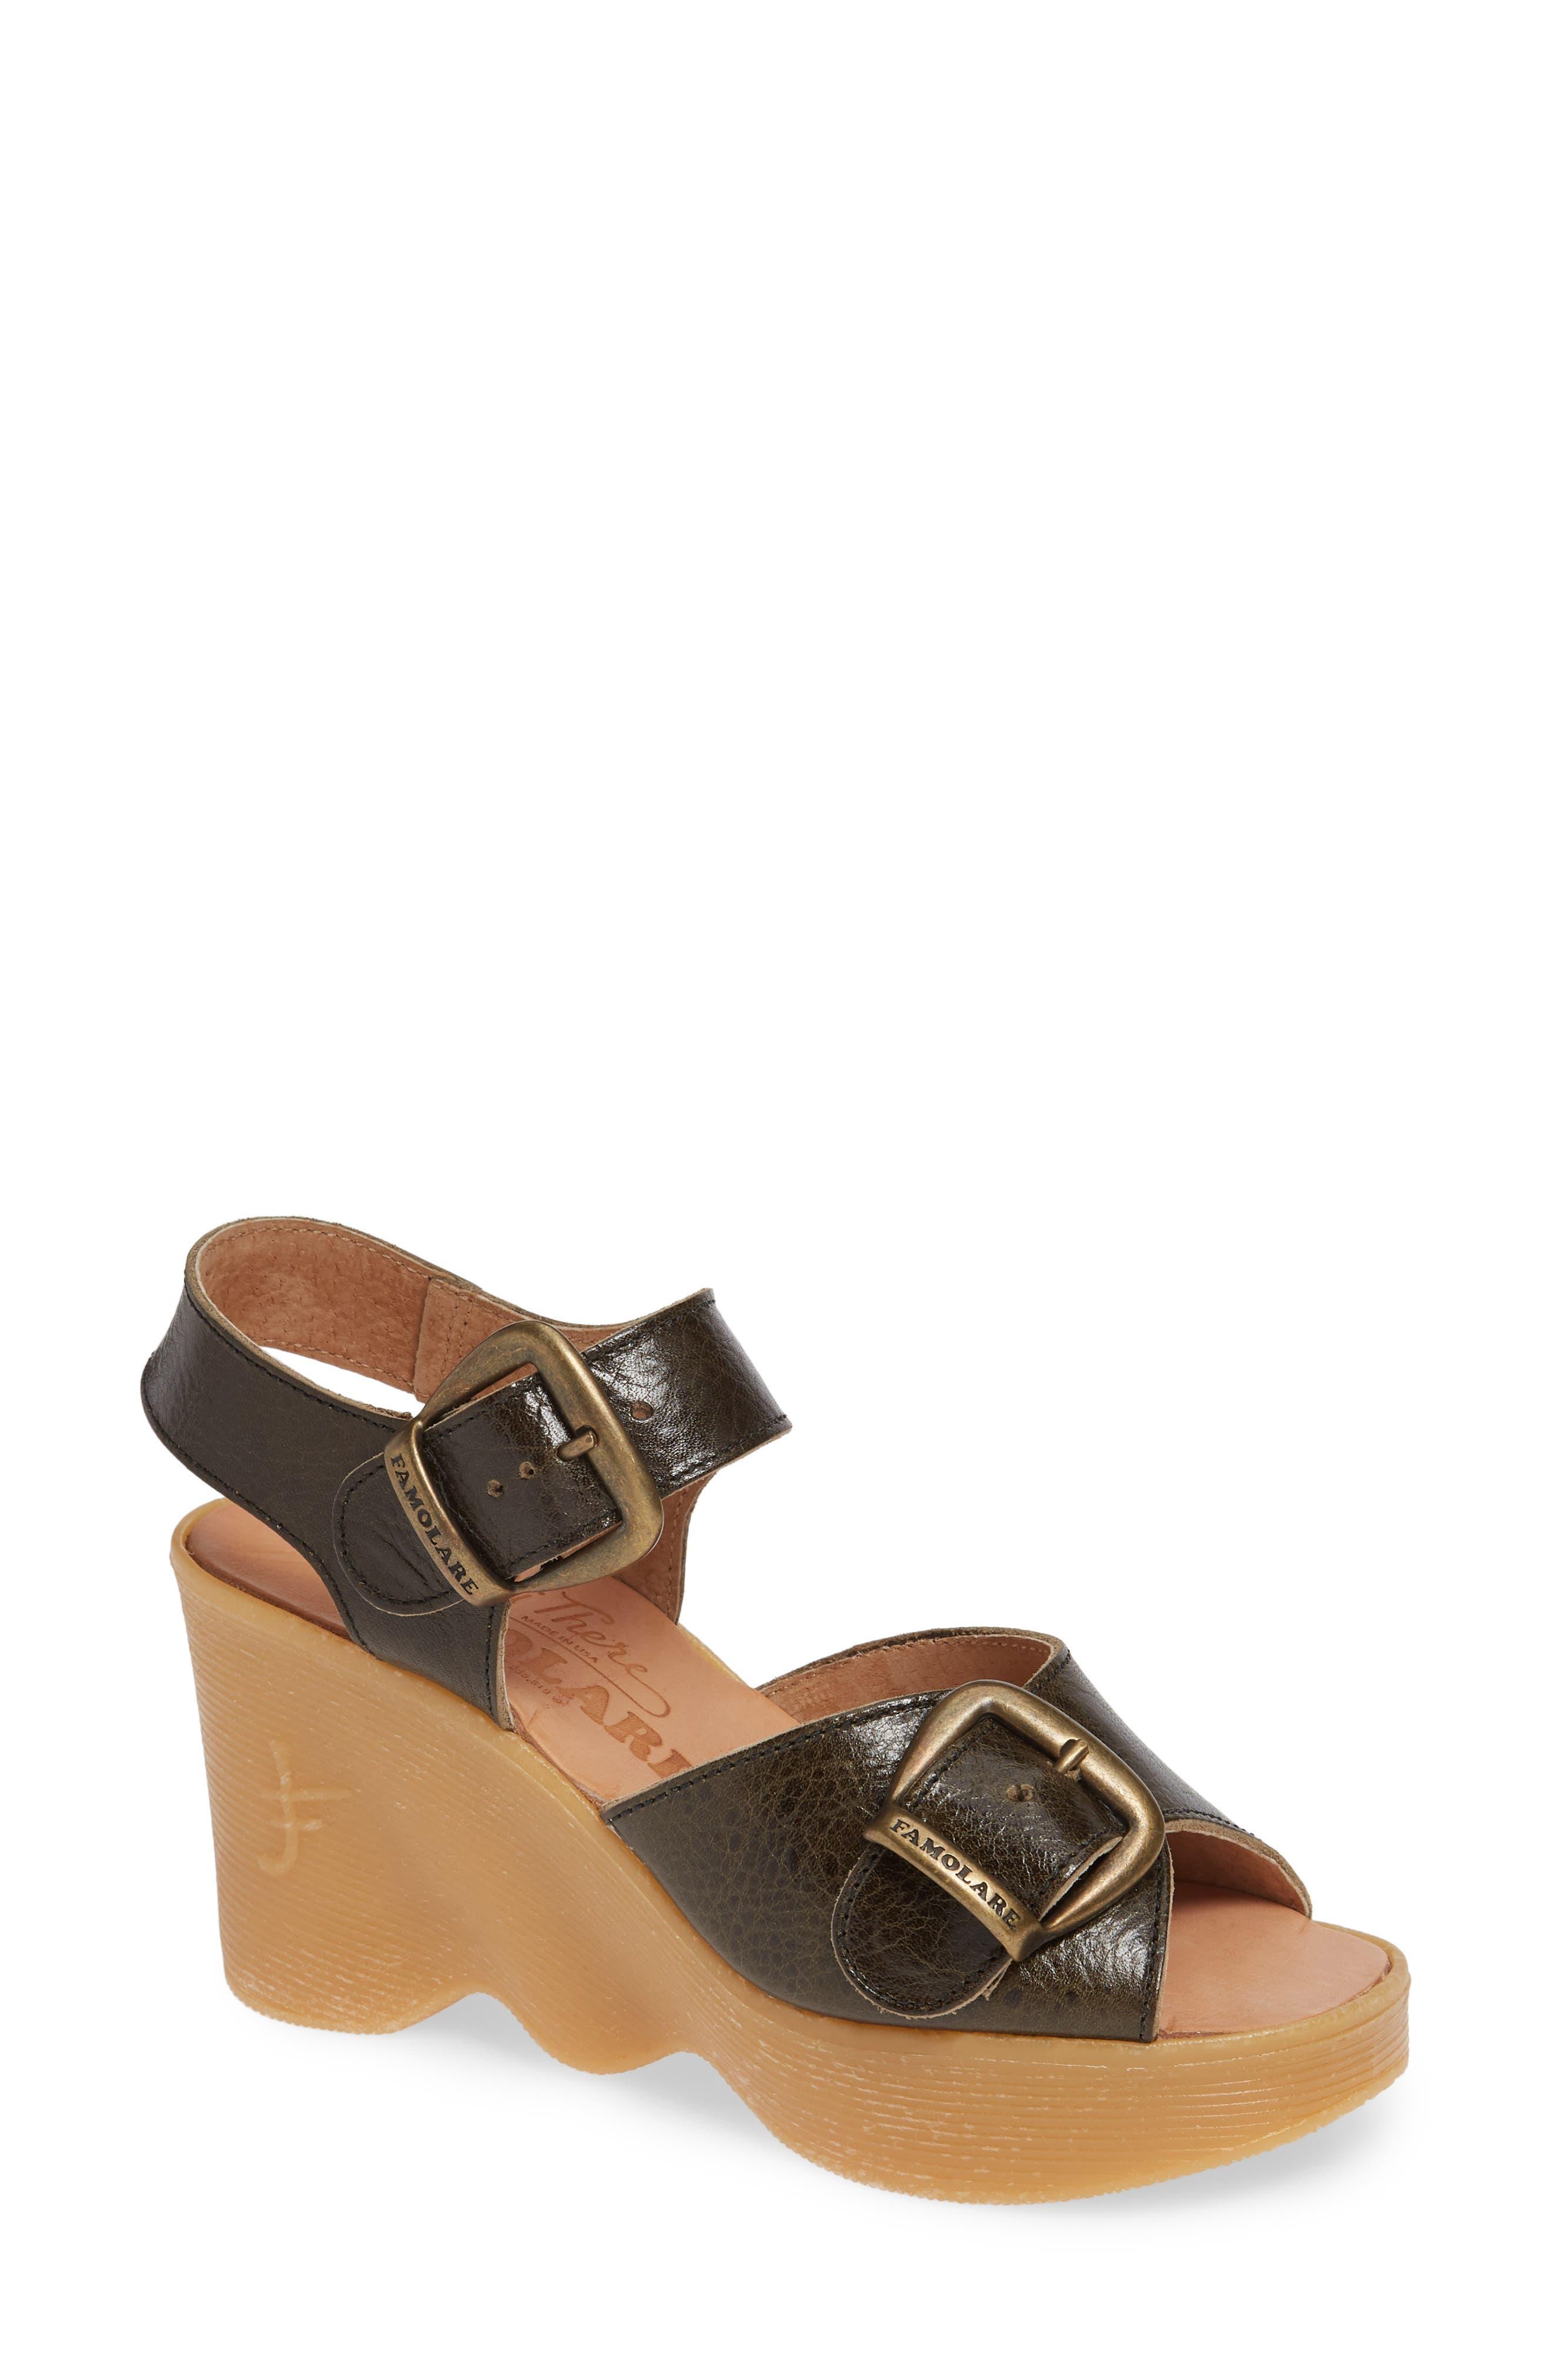 9cc46c65d82 Women s Orange Platform Sandals  Wedge